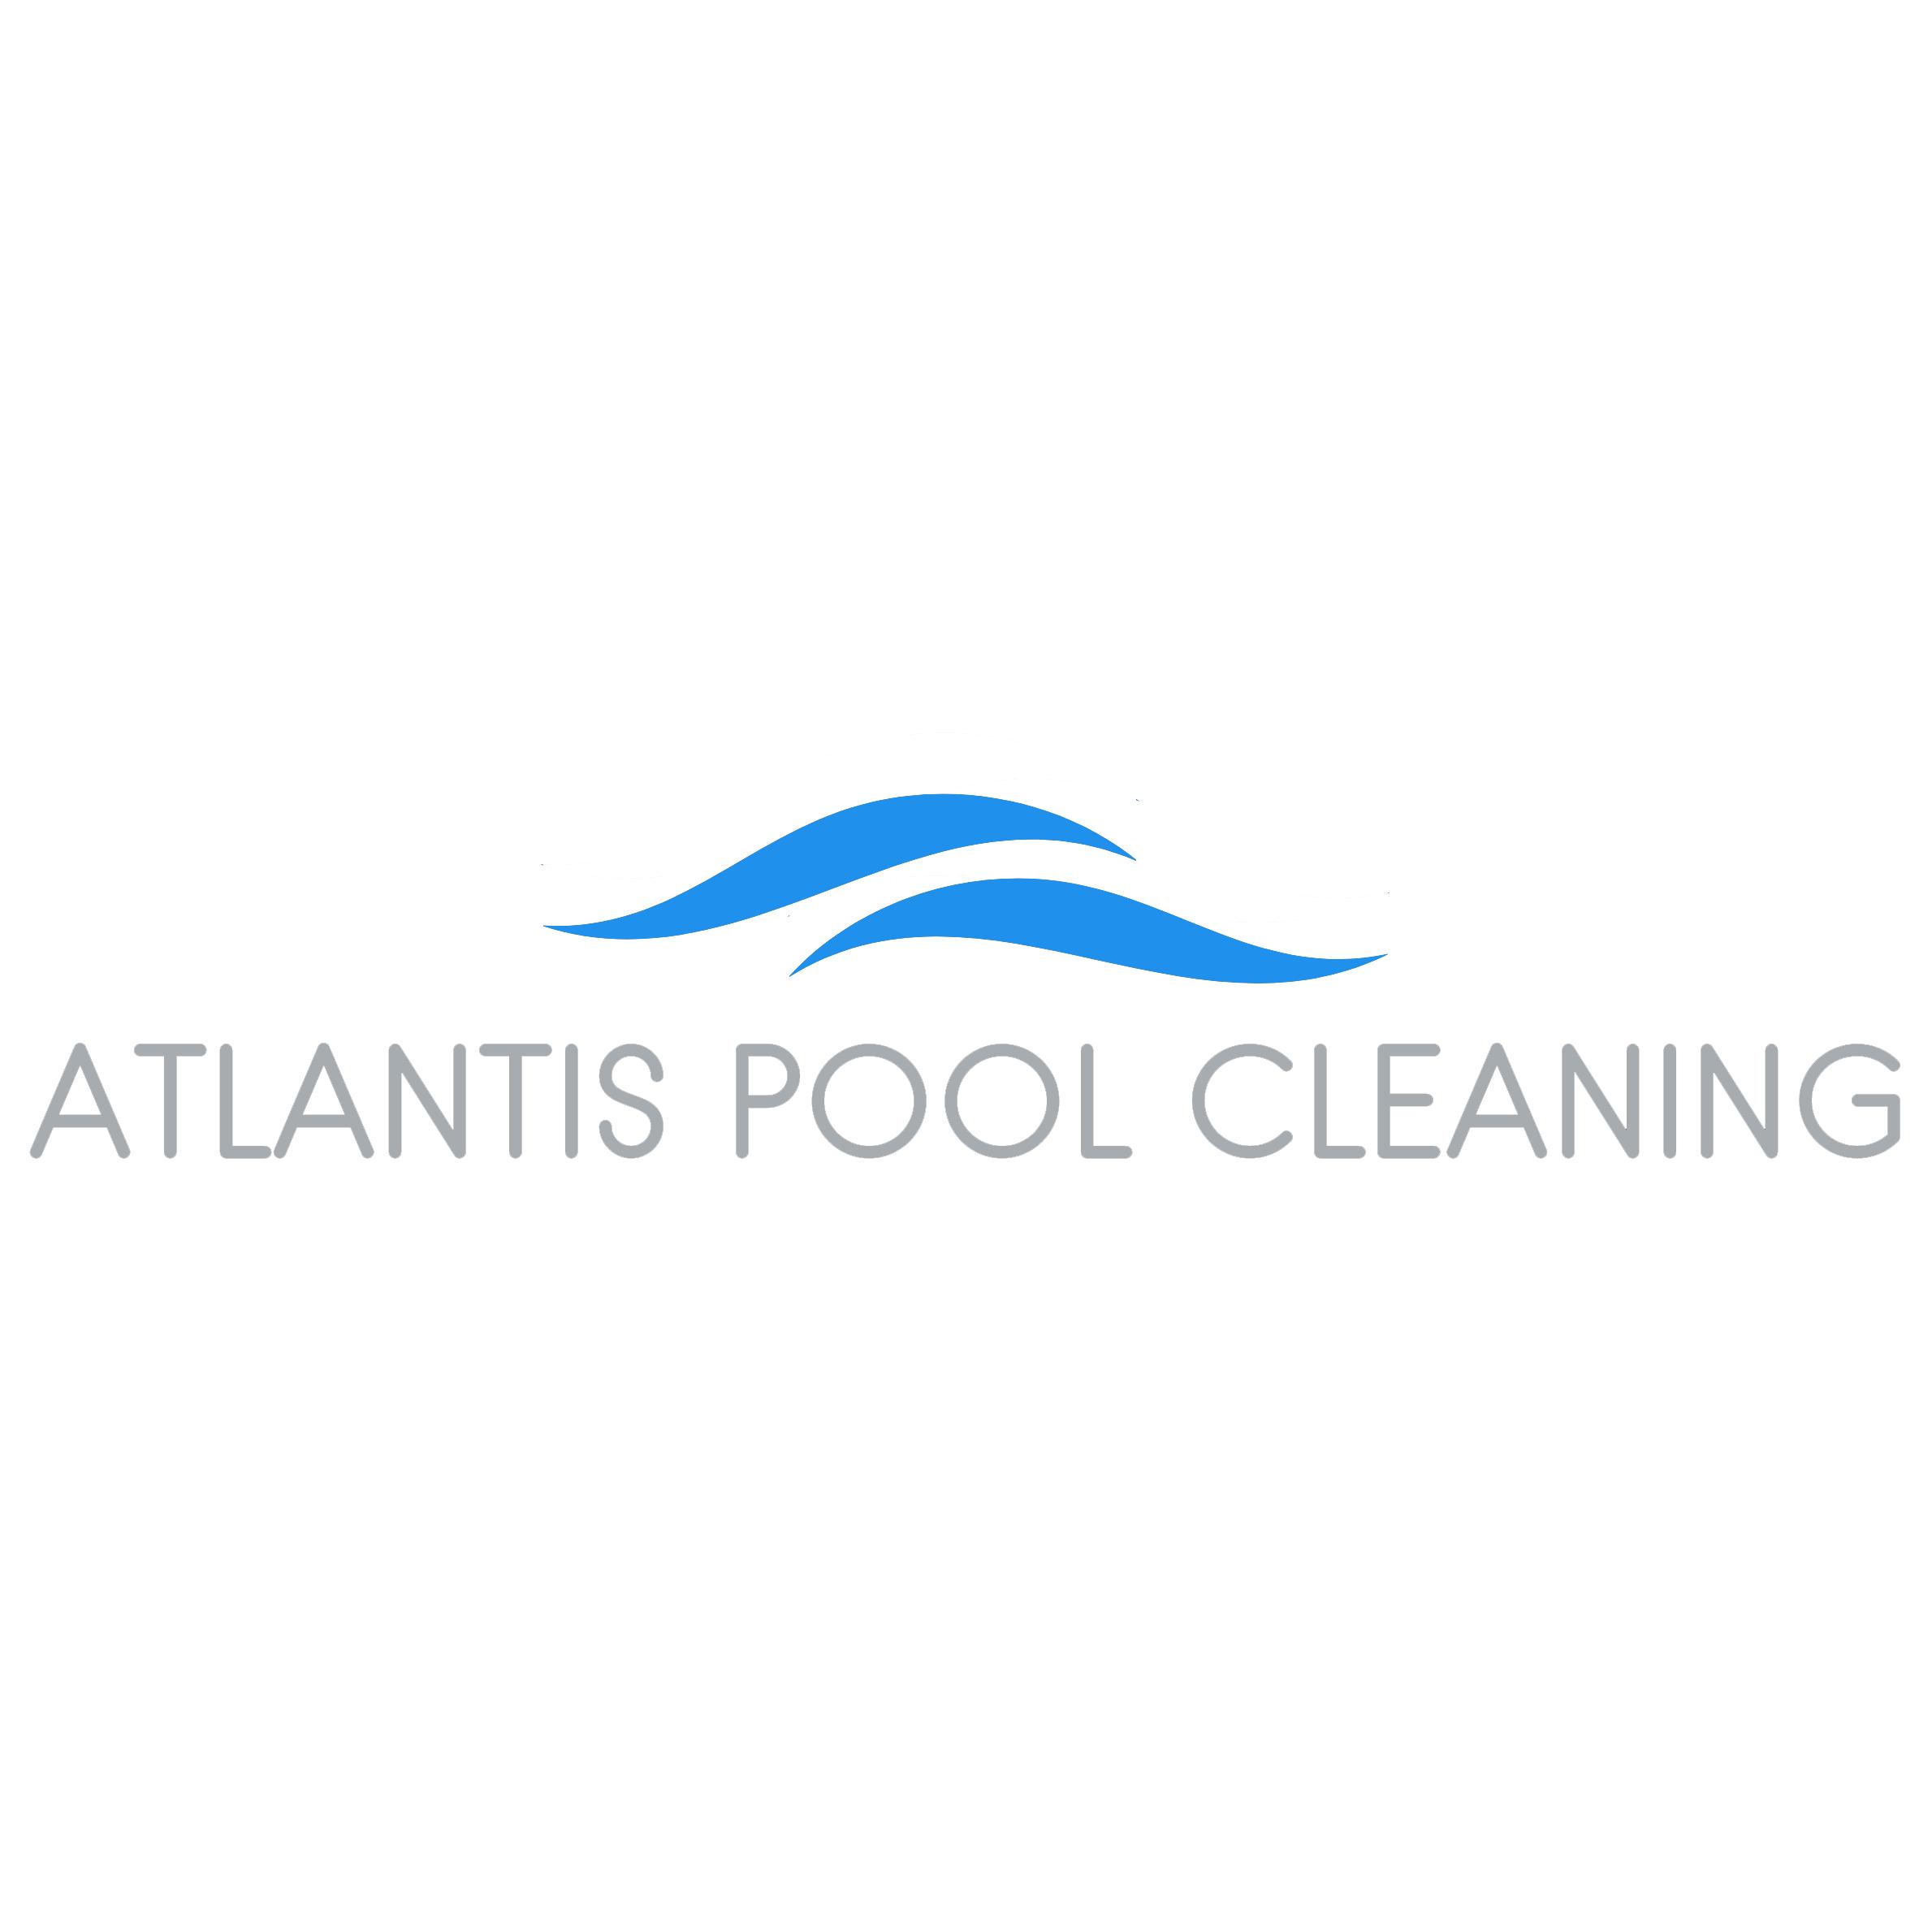 Atlantis Pool Cleaning - Charlotte, NC - Swimming Pools & Spas